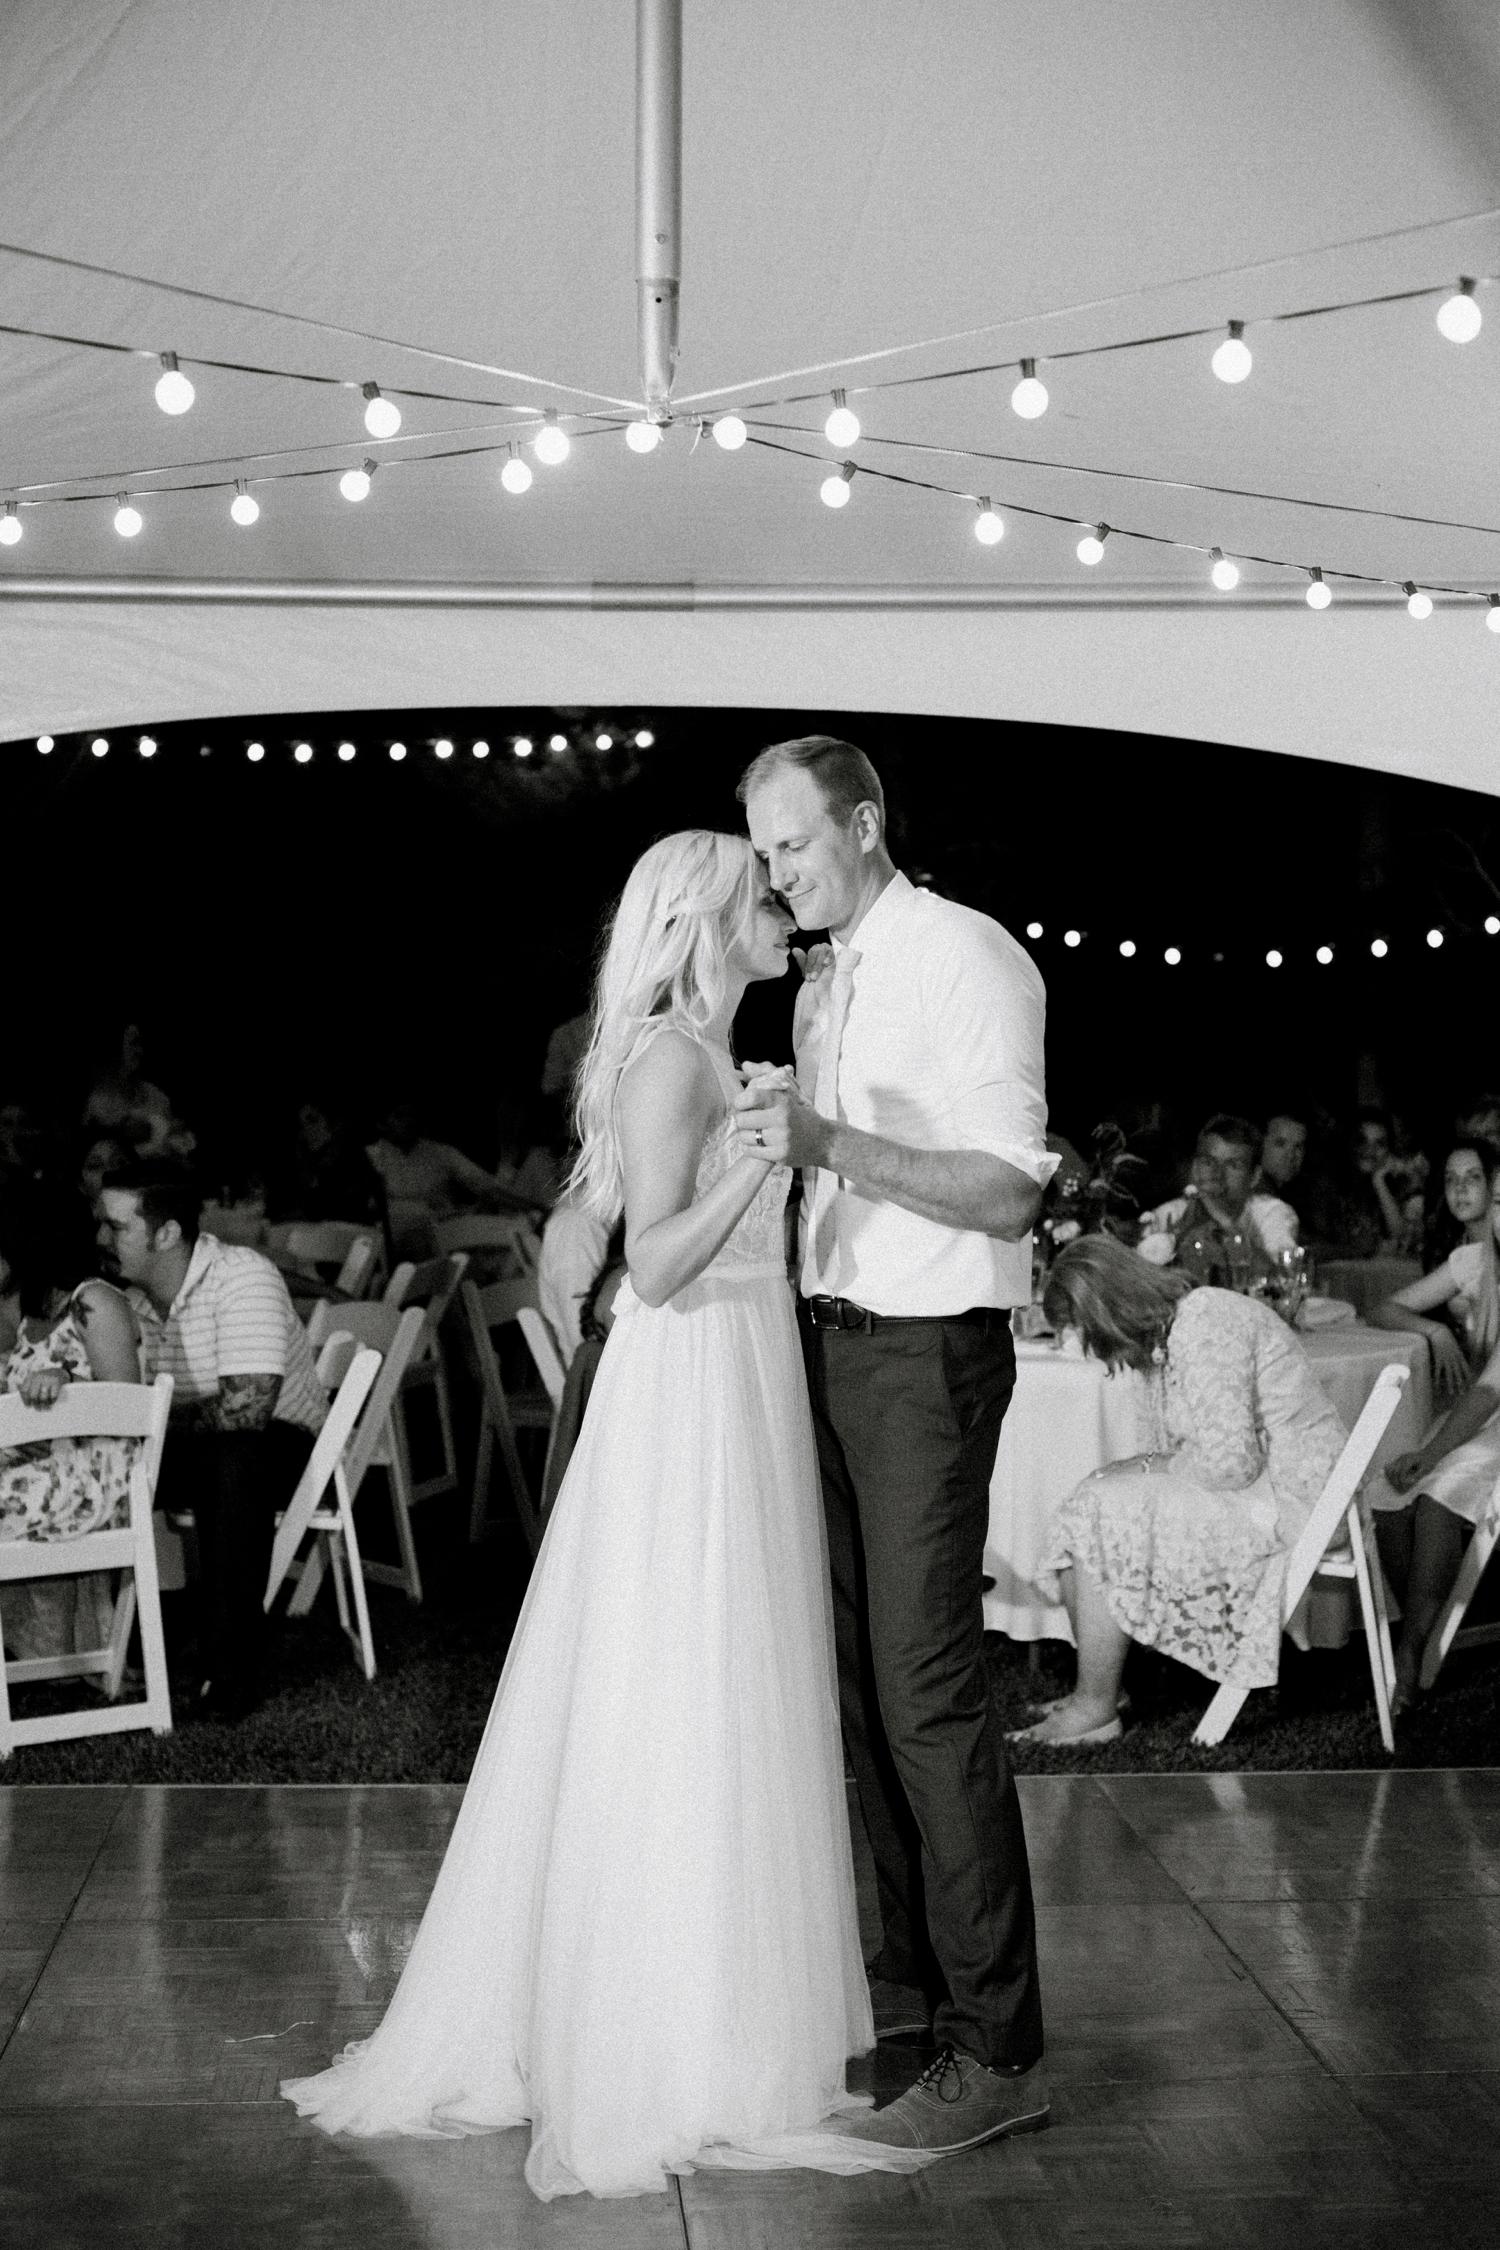 zion-wedding-photography-0110.jpg